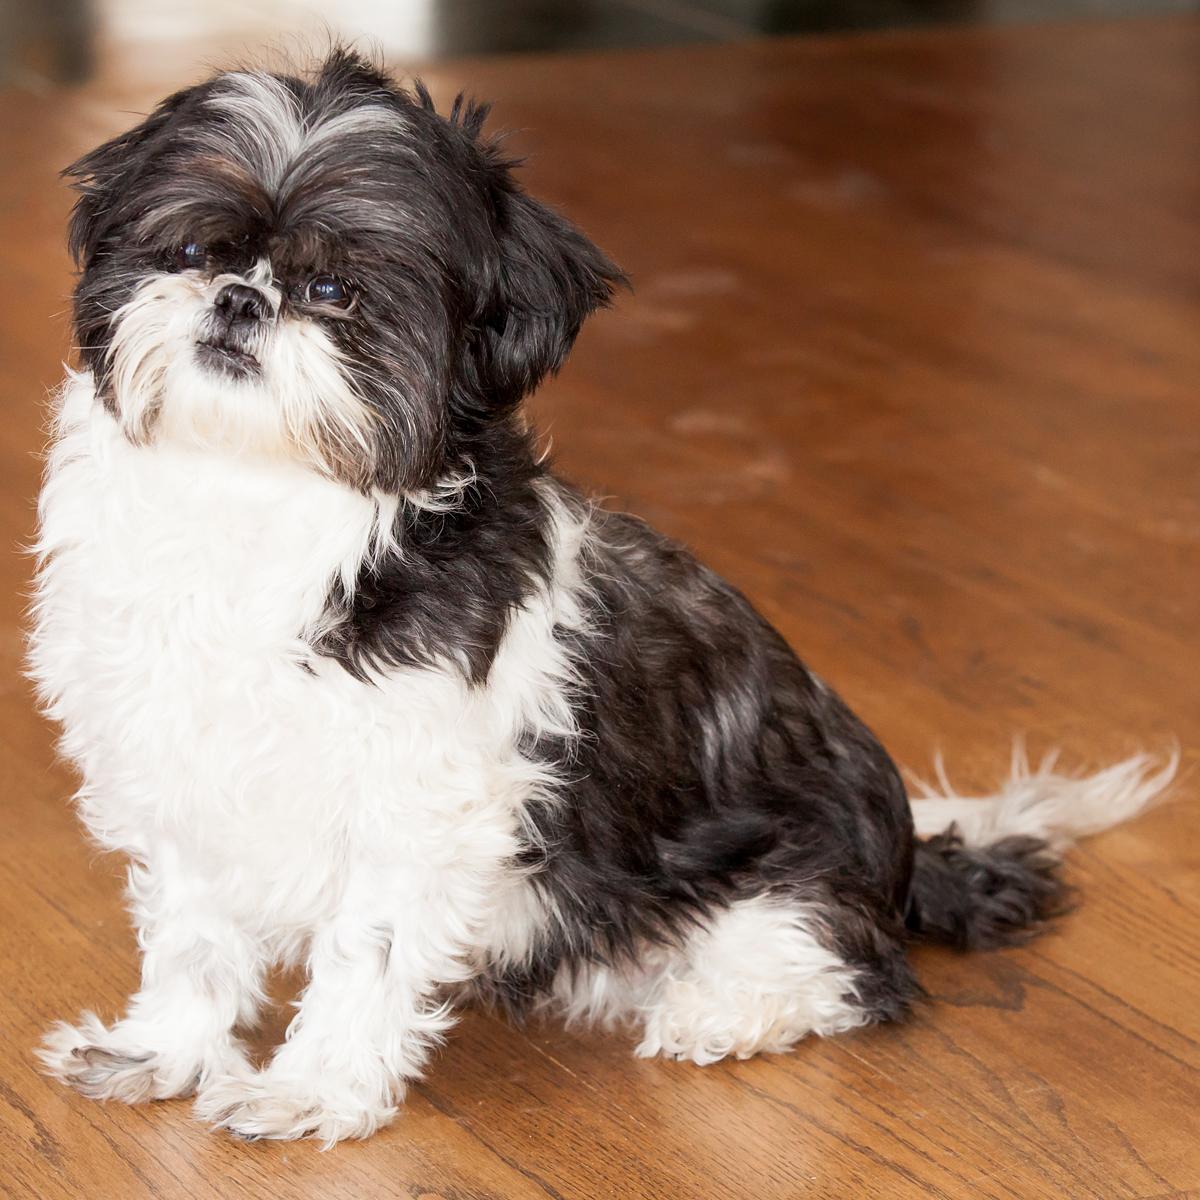 cute funny dog shih tzu